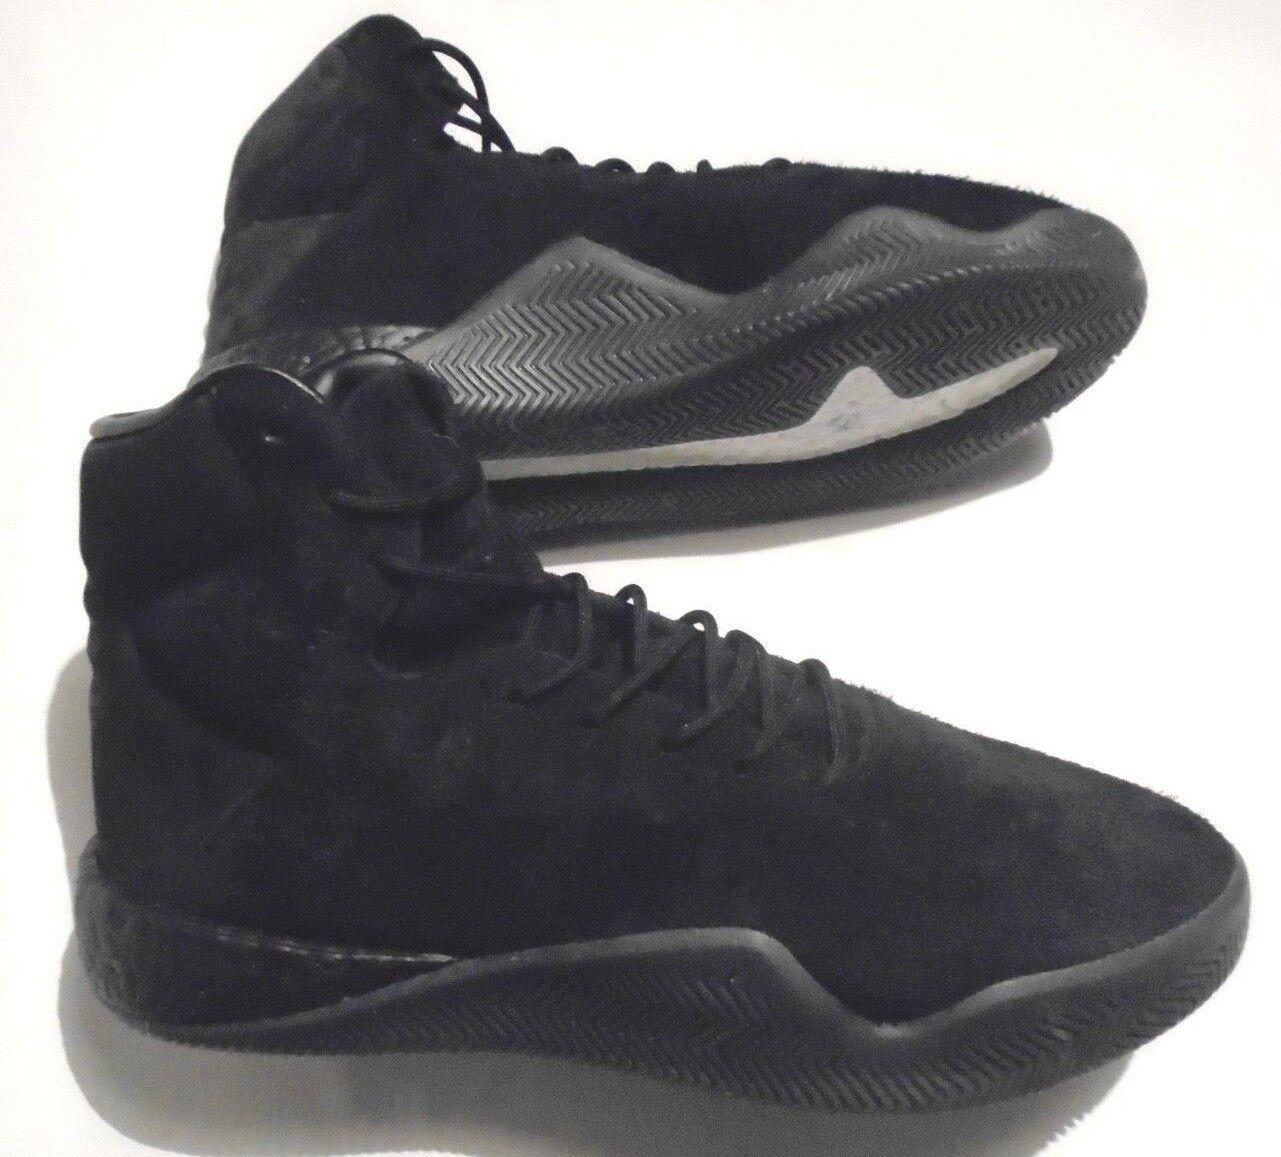 neue adidas originals tubuläre 13 instinkt durch männer größe 13 tubuläre schuhe, schwarze bb8931 1e9844